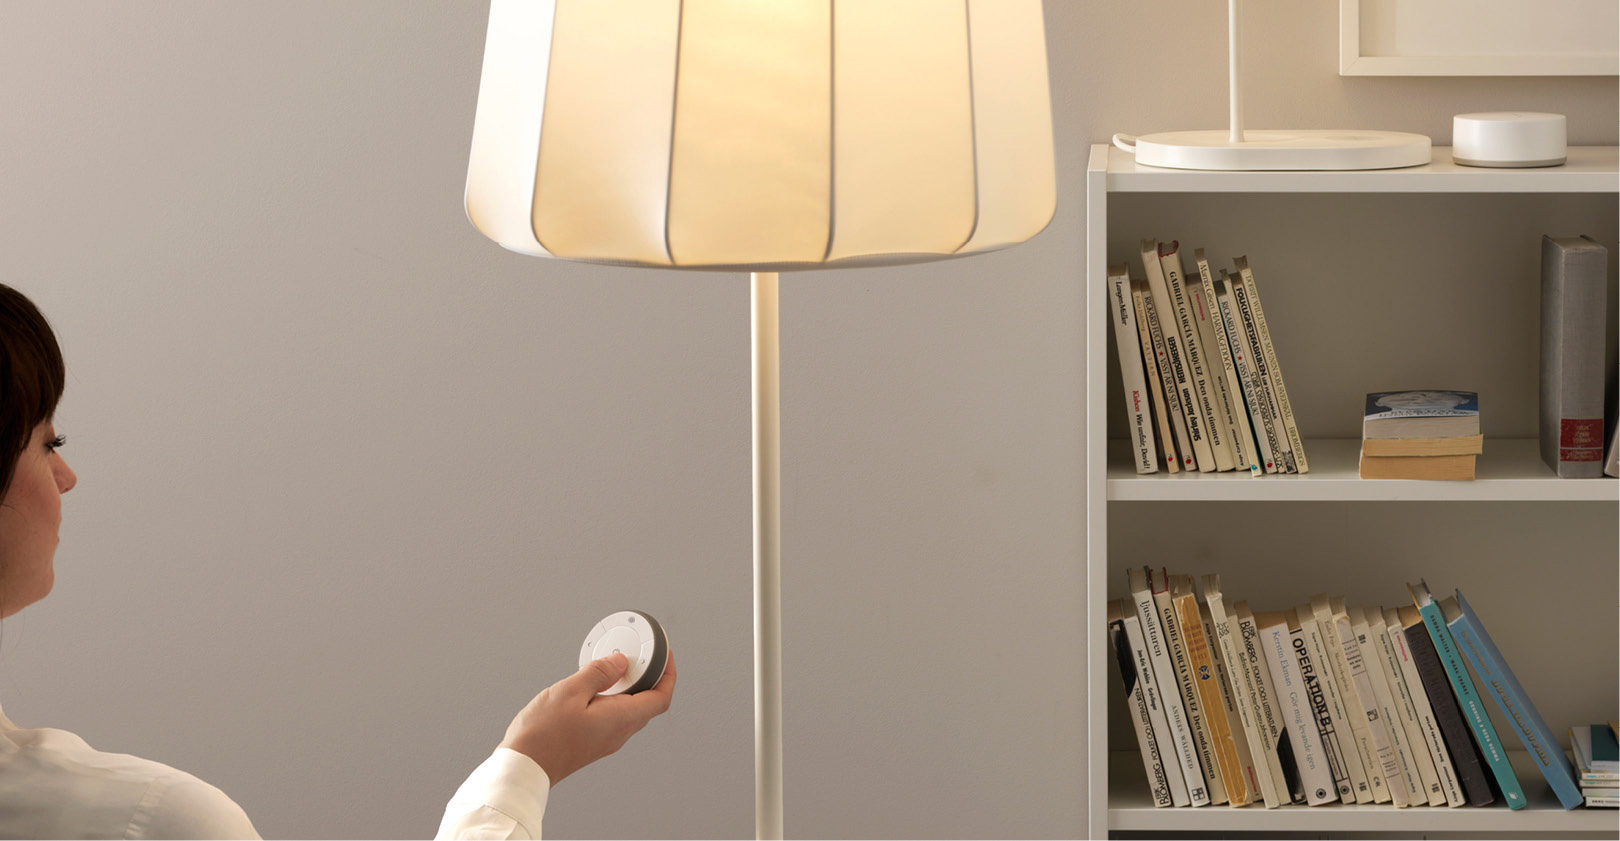 Smart lighting: Ikea goes wireless with its LED bulbs - Blog La Triveneta Cavi